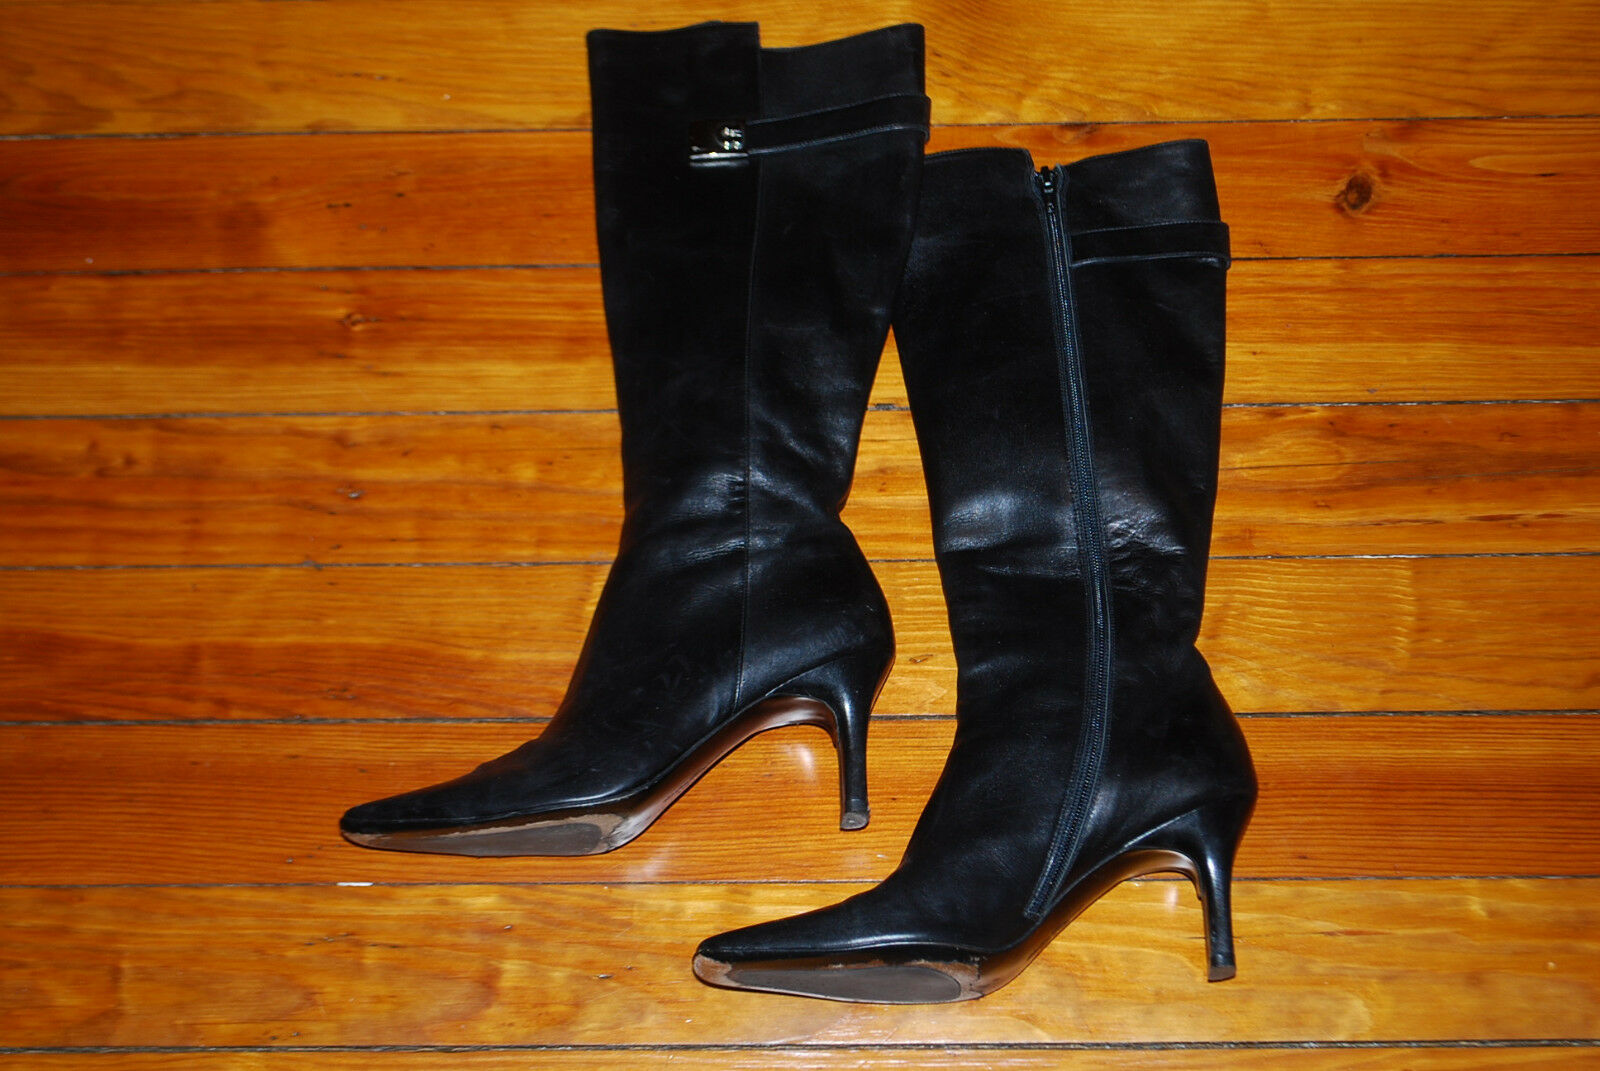 Pleaser Puntera Abierta/tacón Abierta/tacón Puntera con cordones botín oculto bolsillo de cremallera negro/plata 2a897a